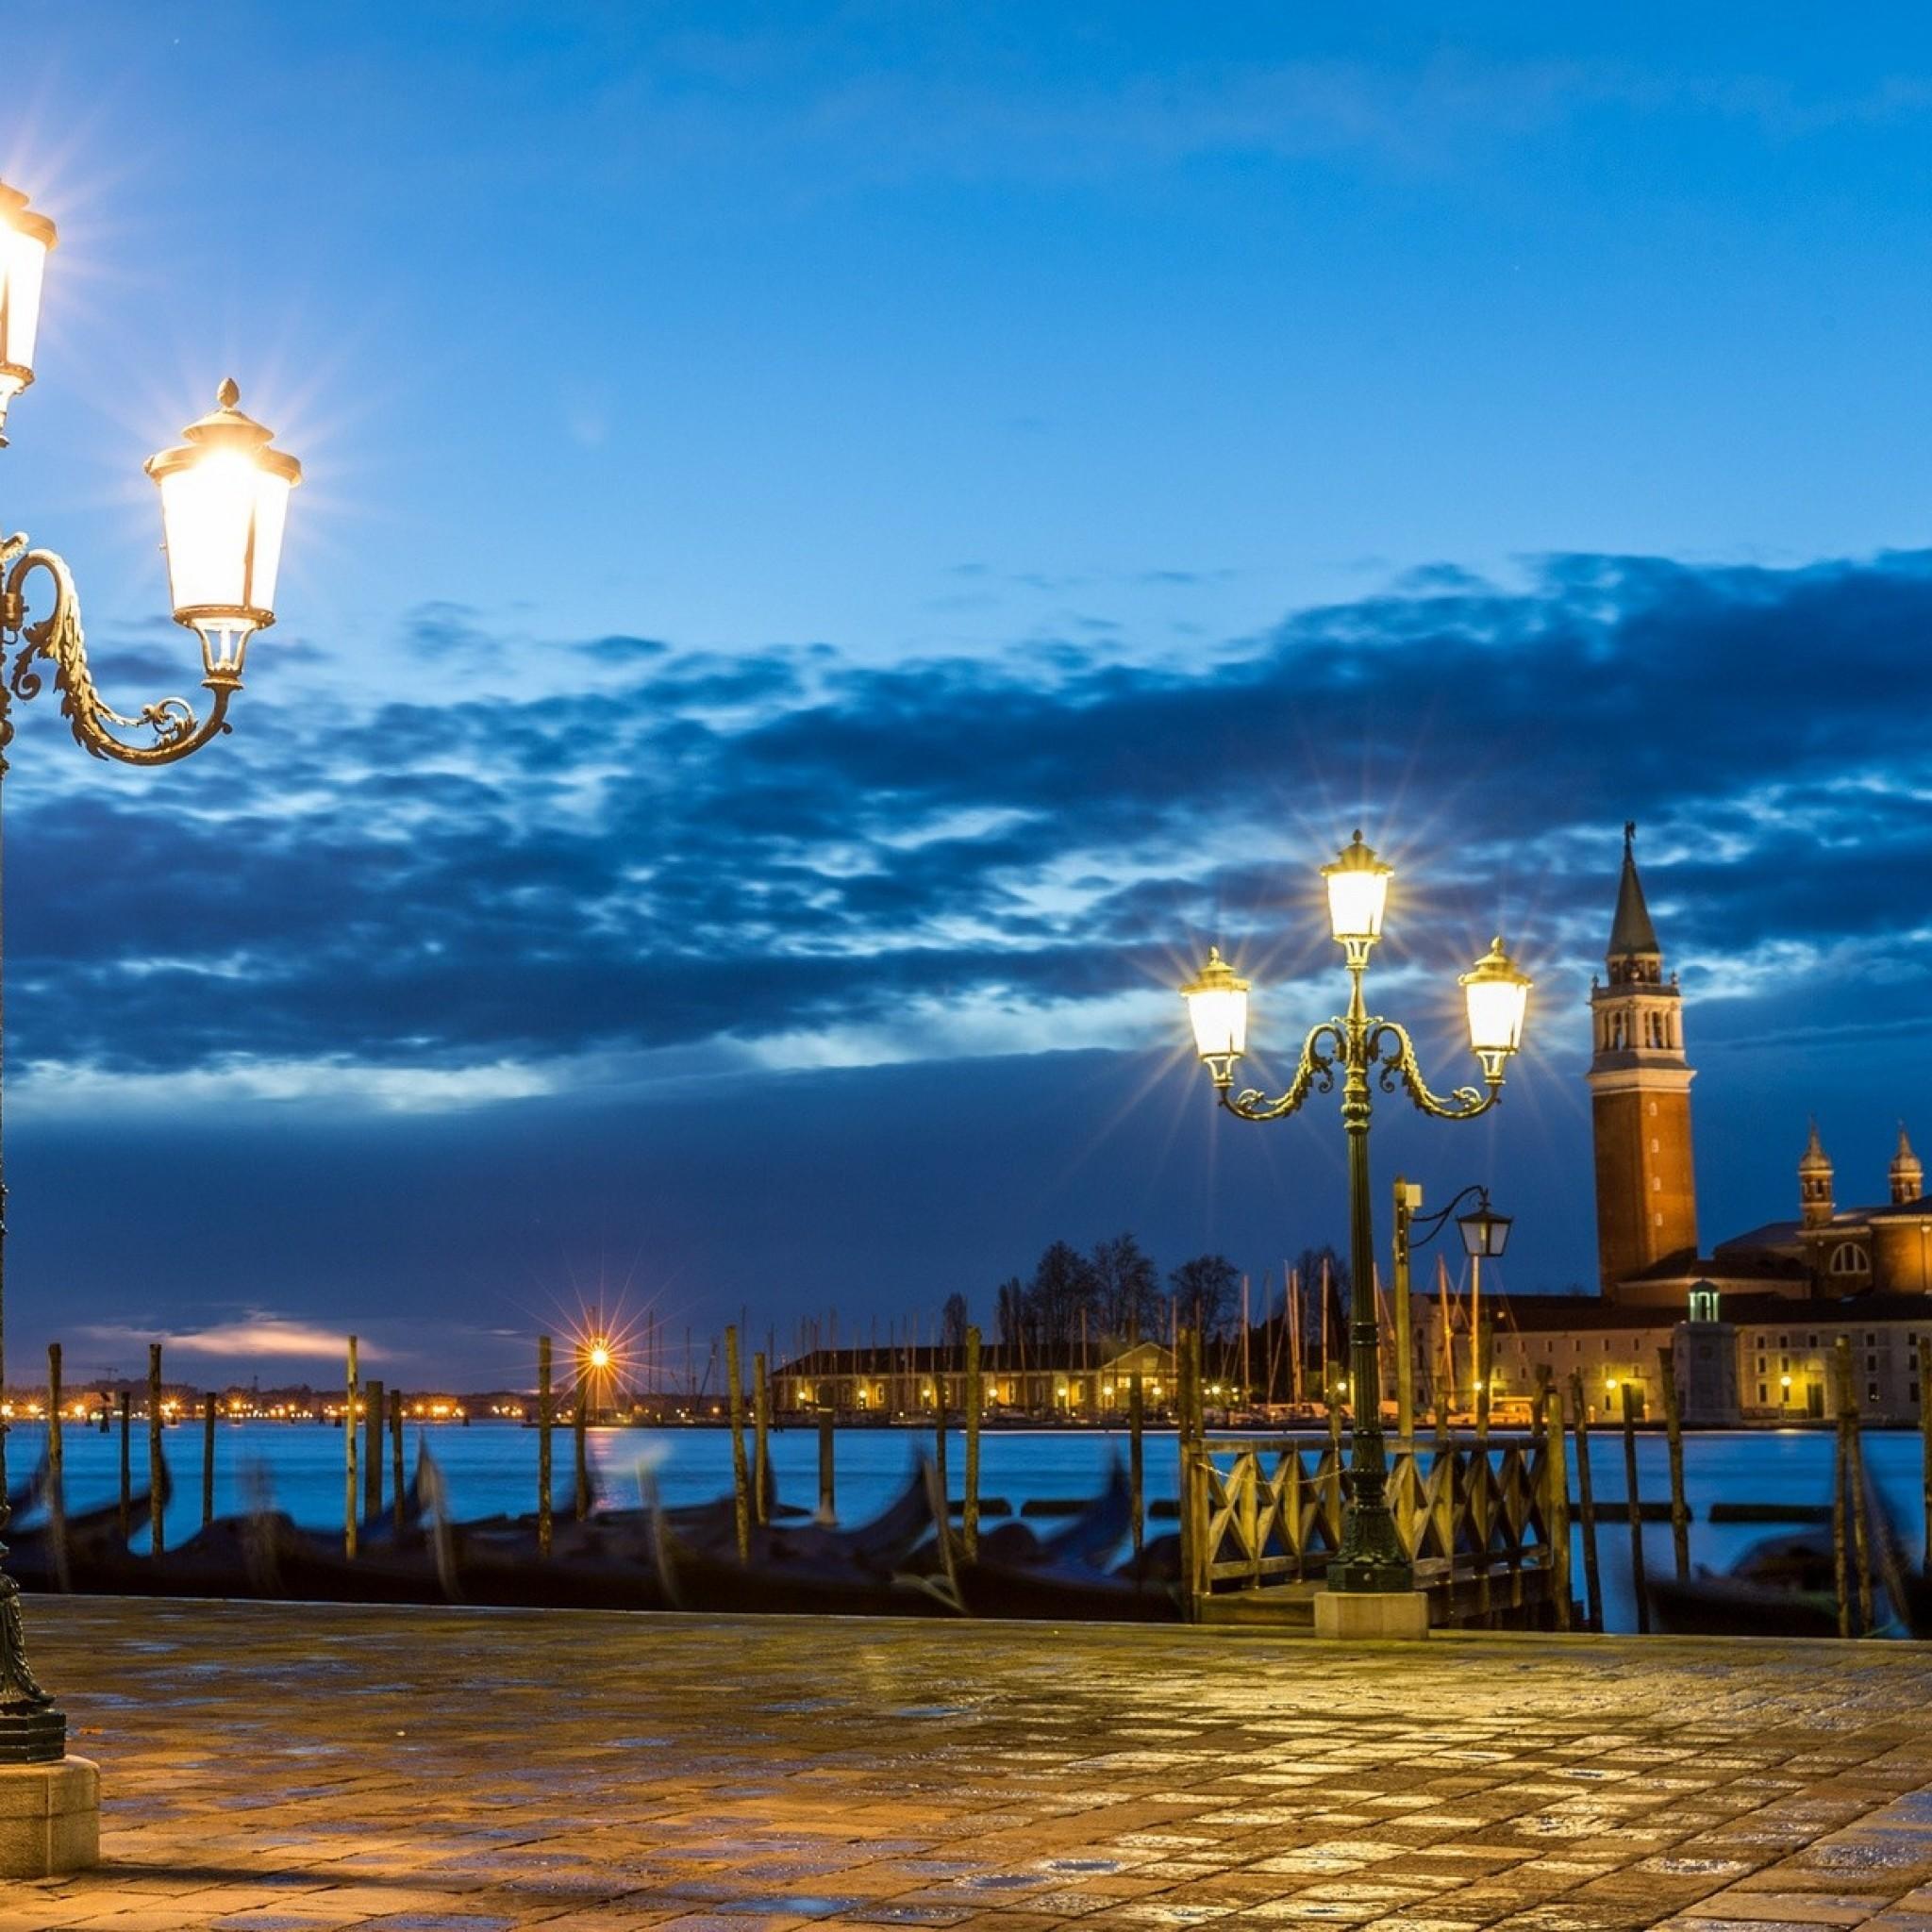 Venice Italy Desktop Wallpaper (54+ Images